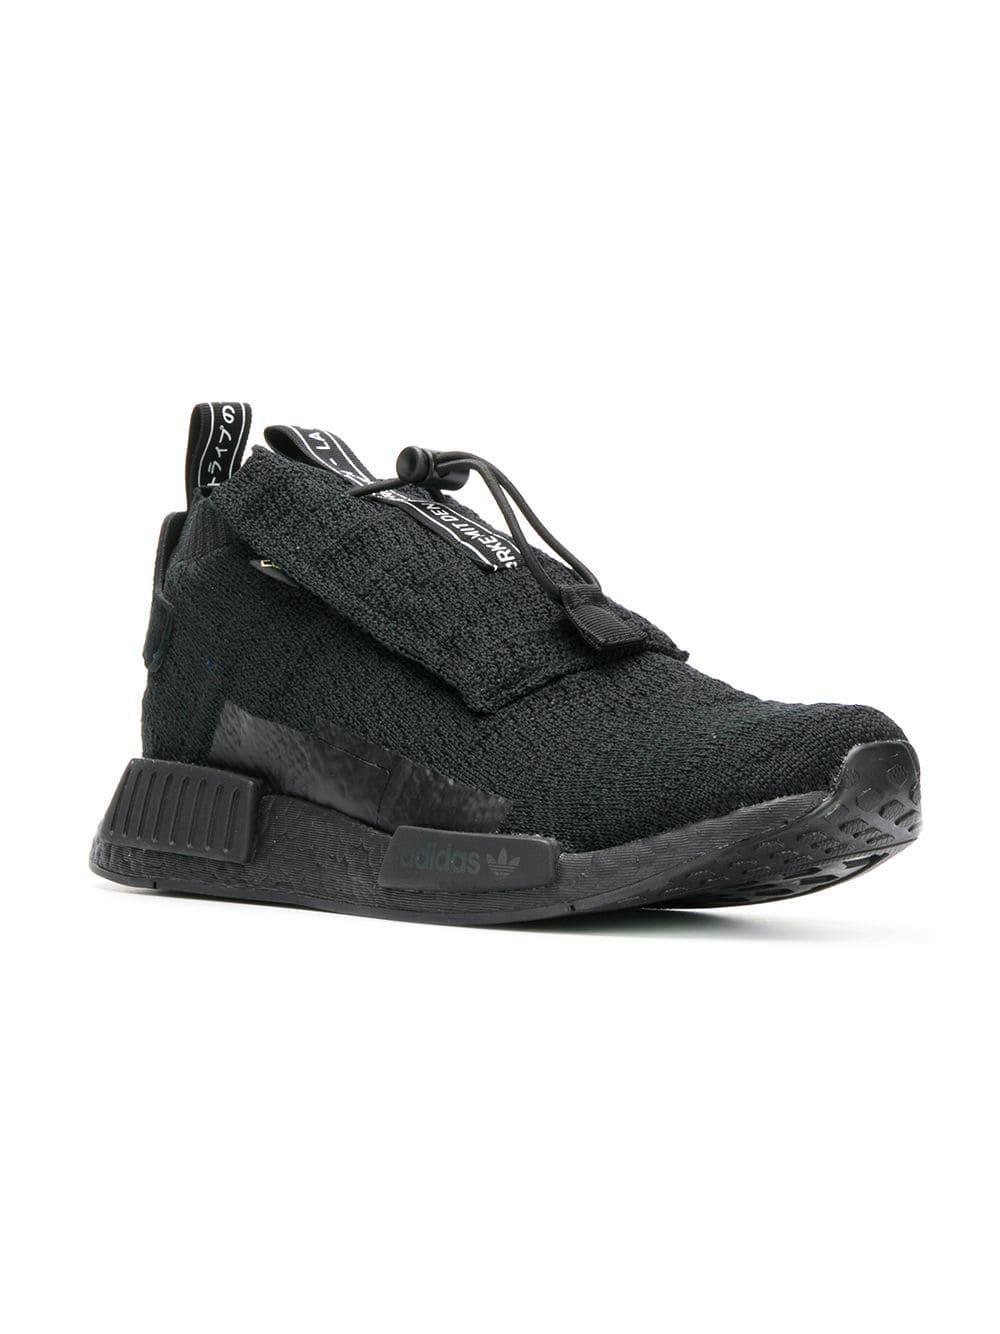 546a370b94f2e Lyst - adidas Black Nmd Ts1 Pk Gore-tex Primeknit Sneakers in Black for Men